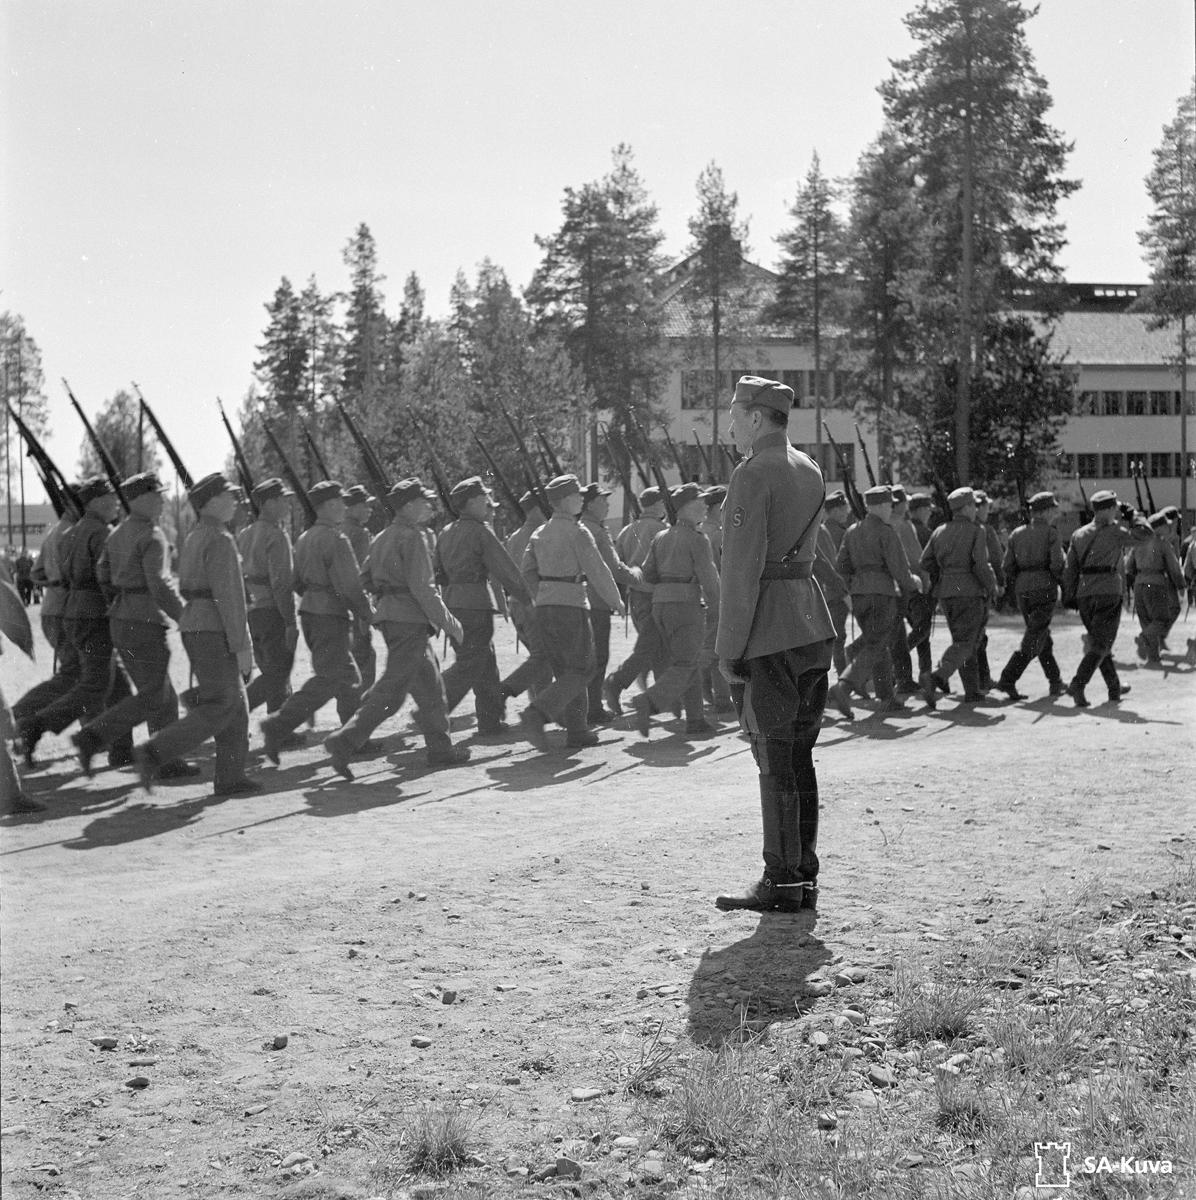 30 мая 1943 года. Маннергейм в Хууханмяки